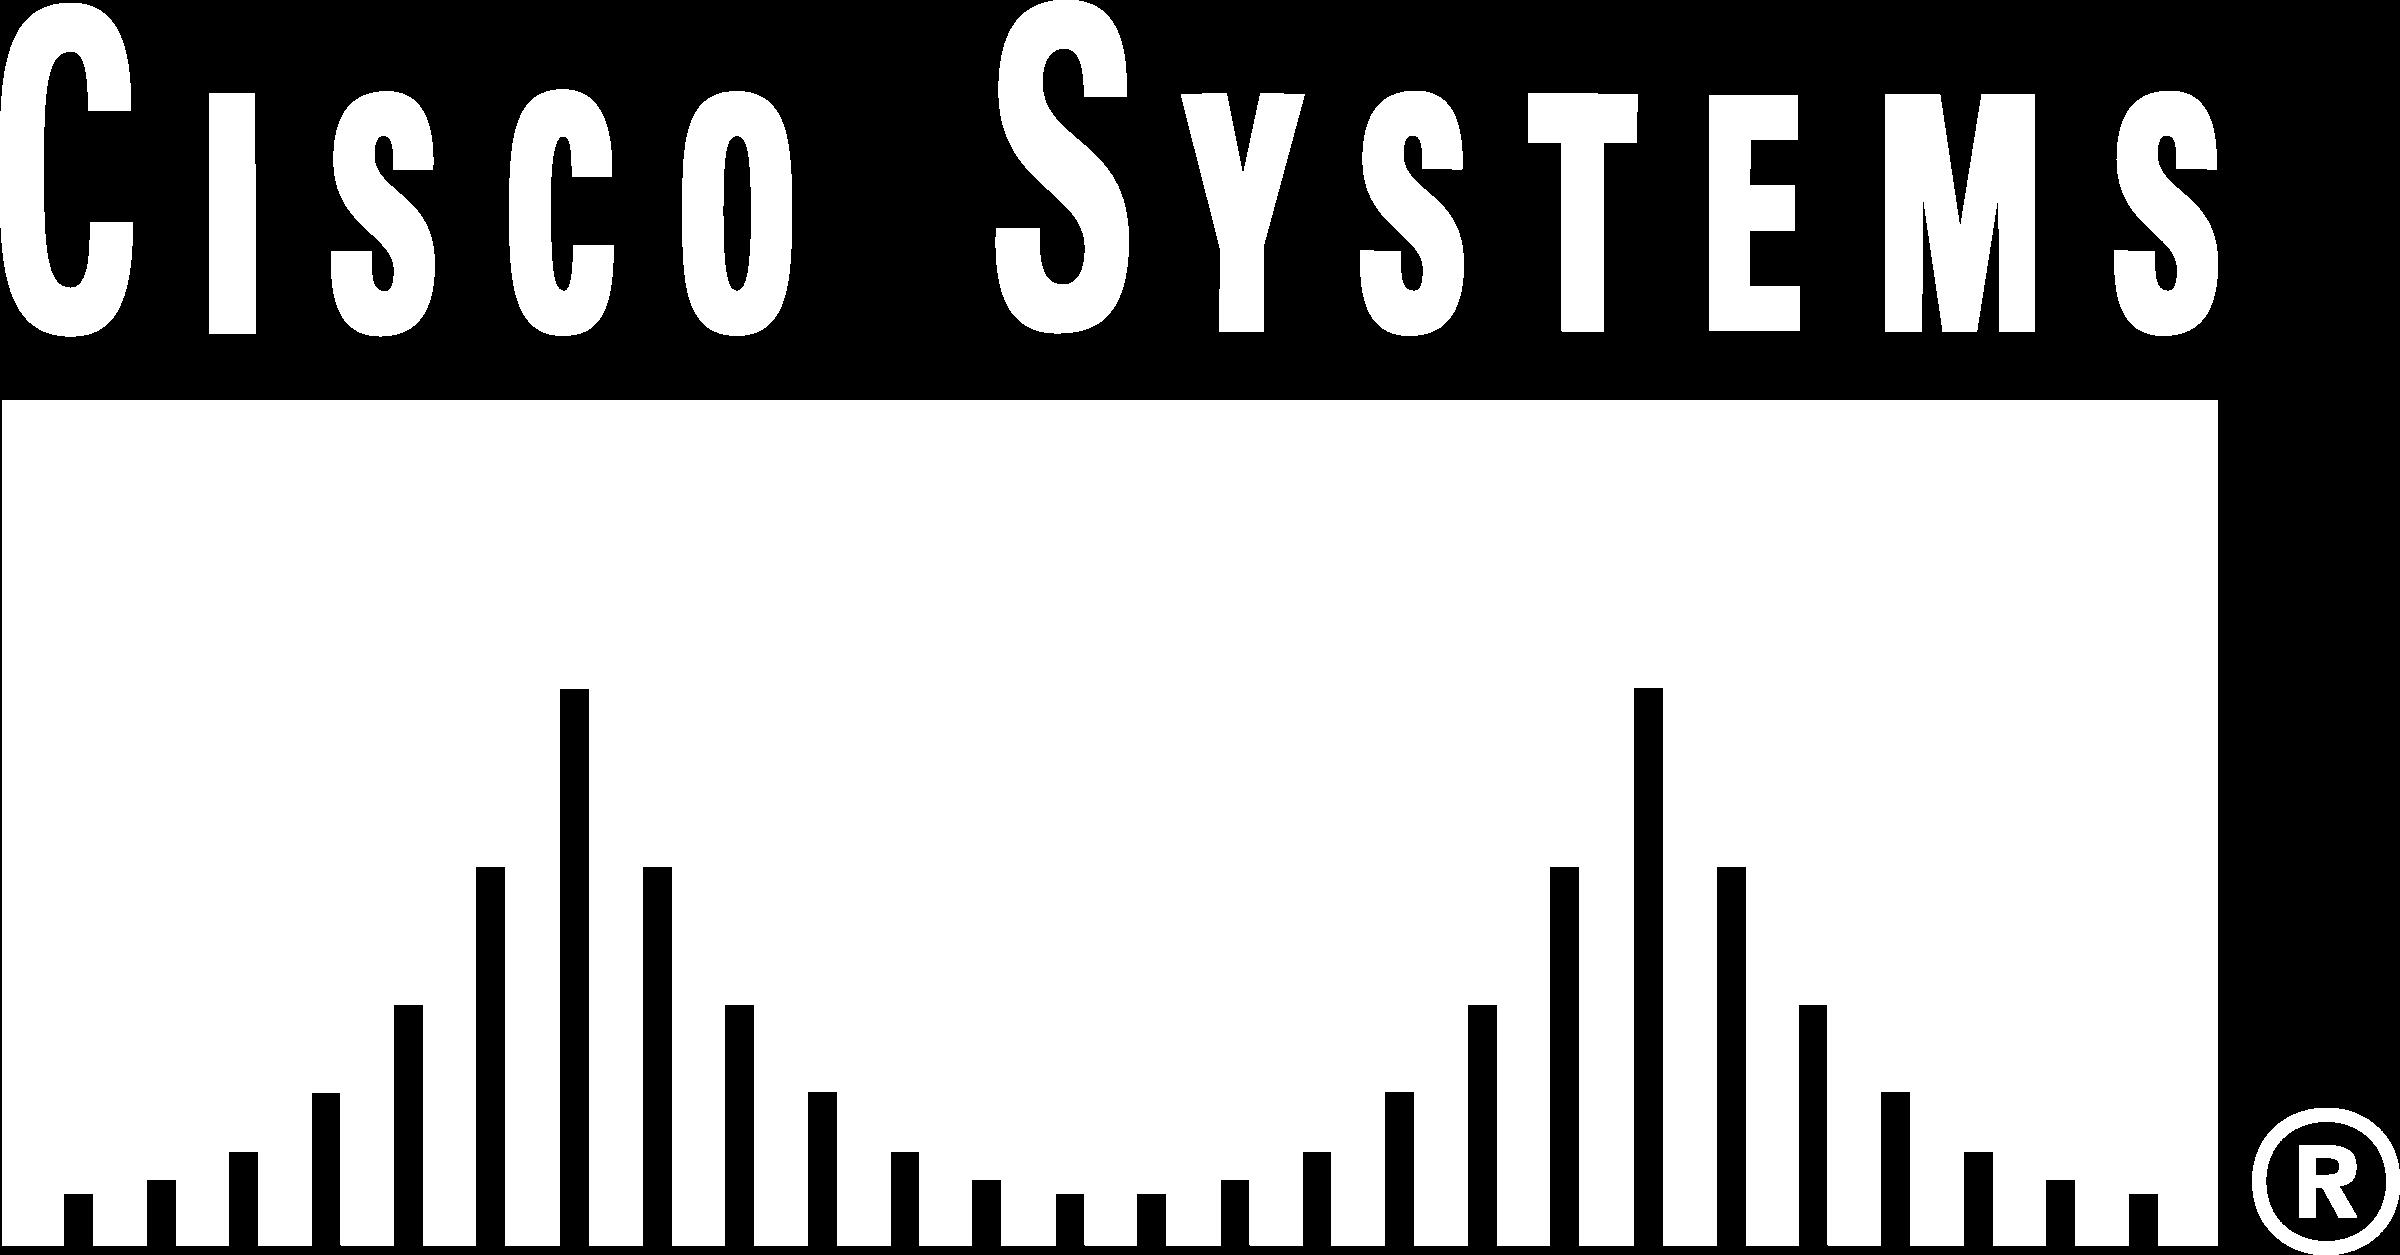 Cisco Systems logo2 Logo PNG Transparent & SVG Vector.